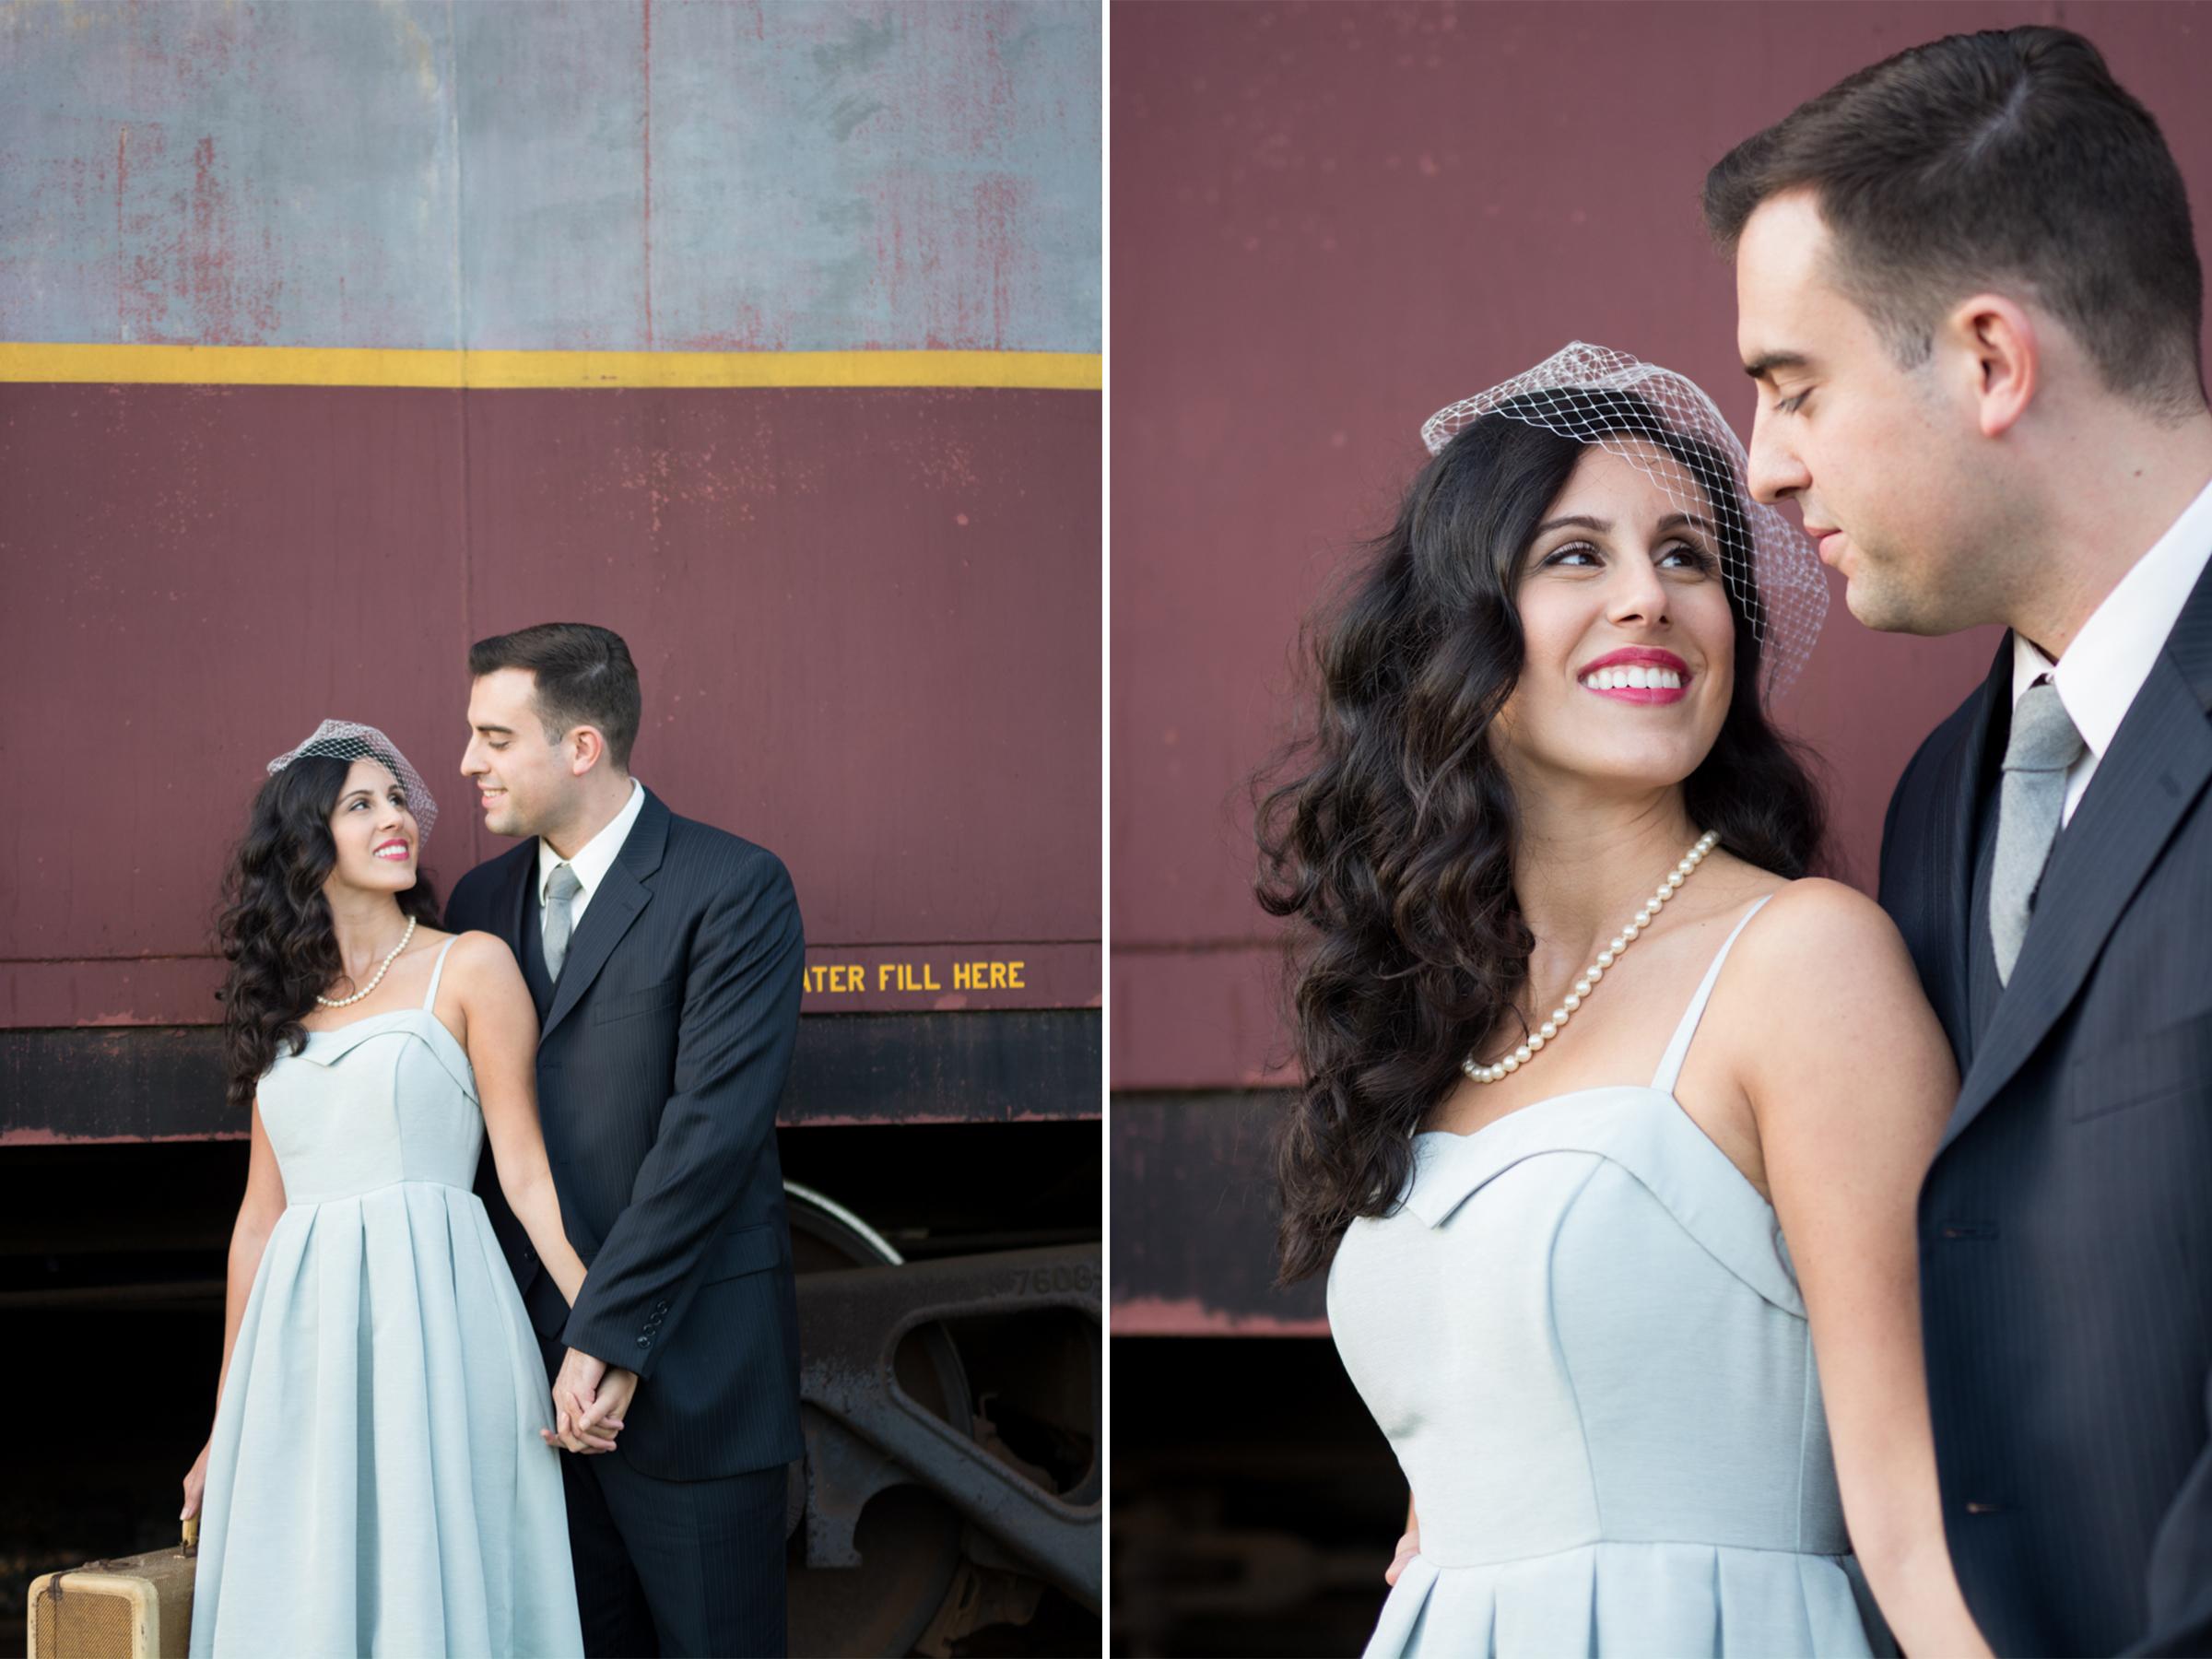 M+J Engagement Photos 7- Whippany Railway Museum- New Jersey -Olivia Christina Photography.jpg